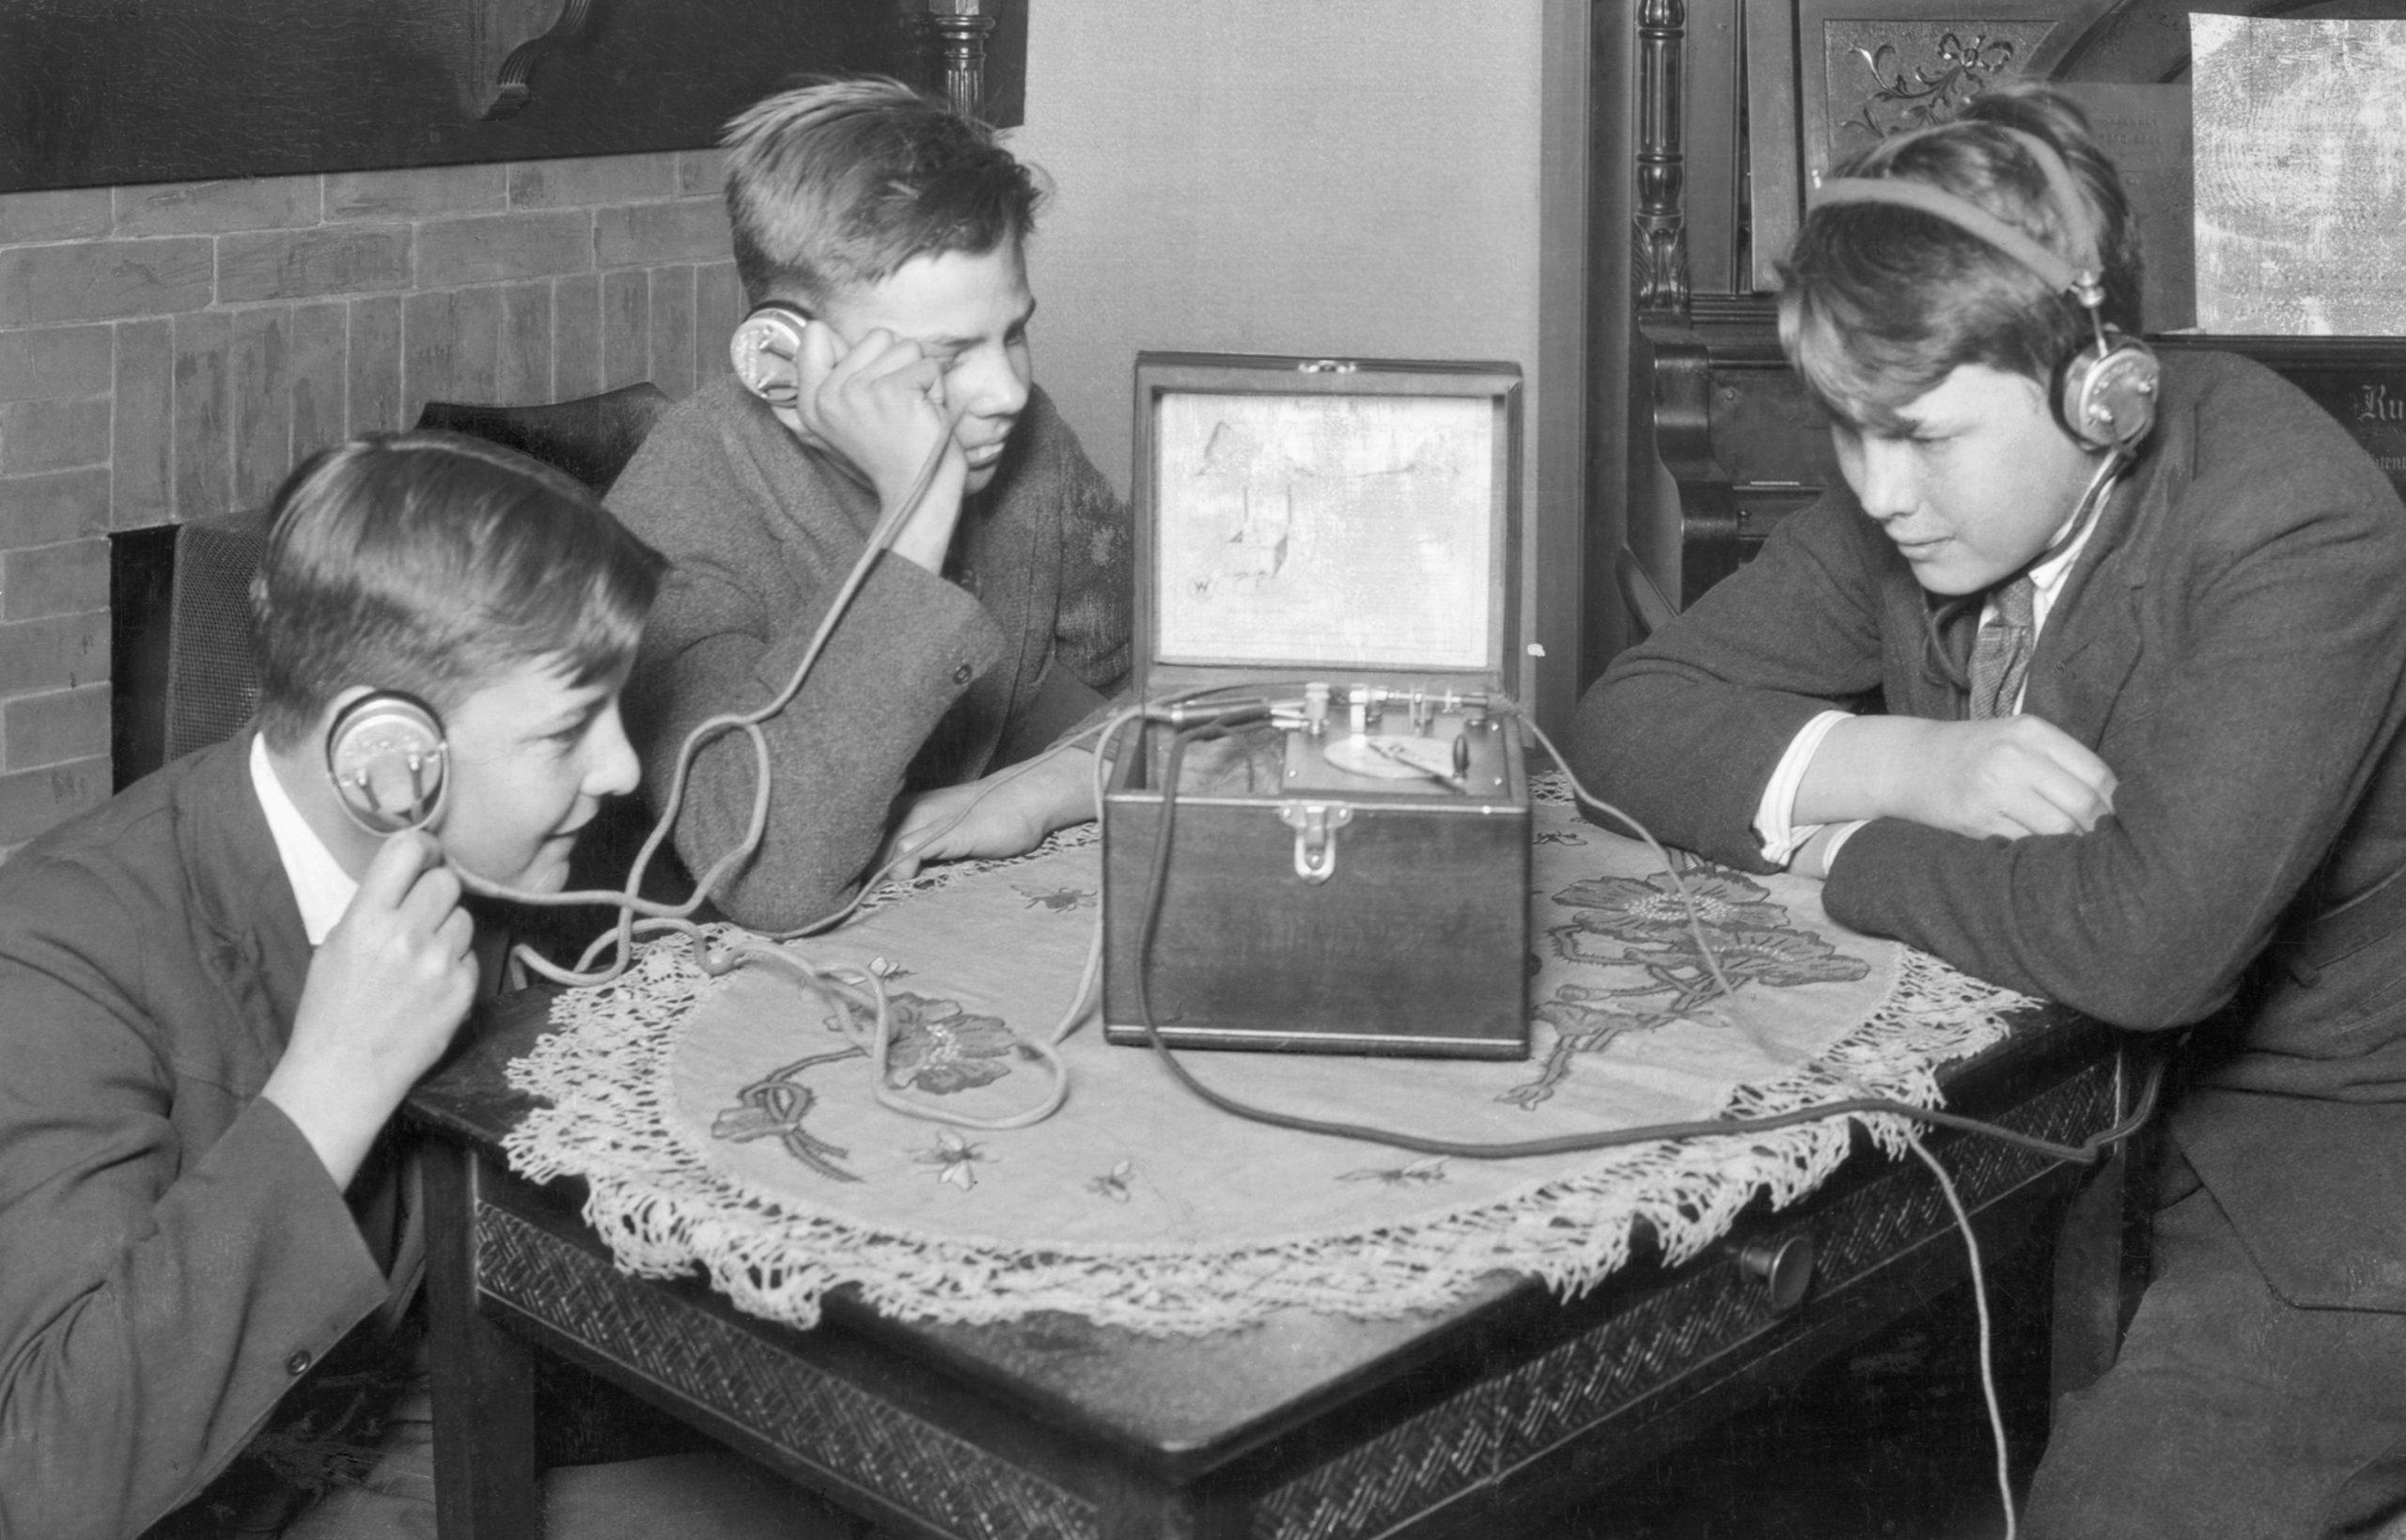 Boys Listen To Early Radio